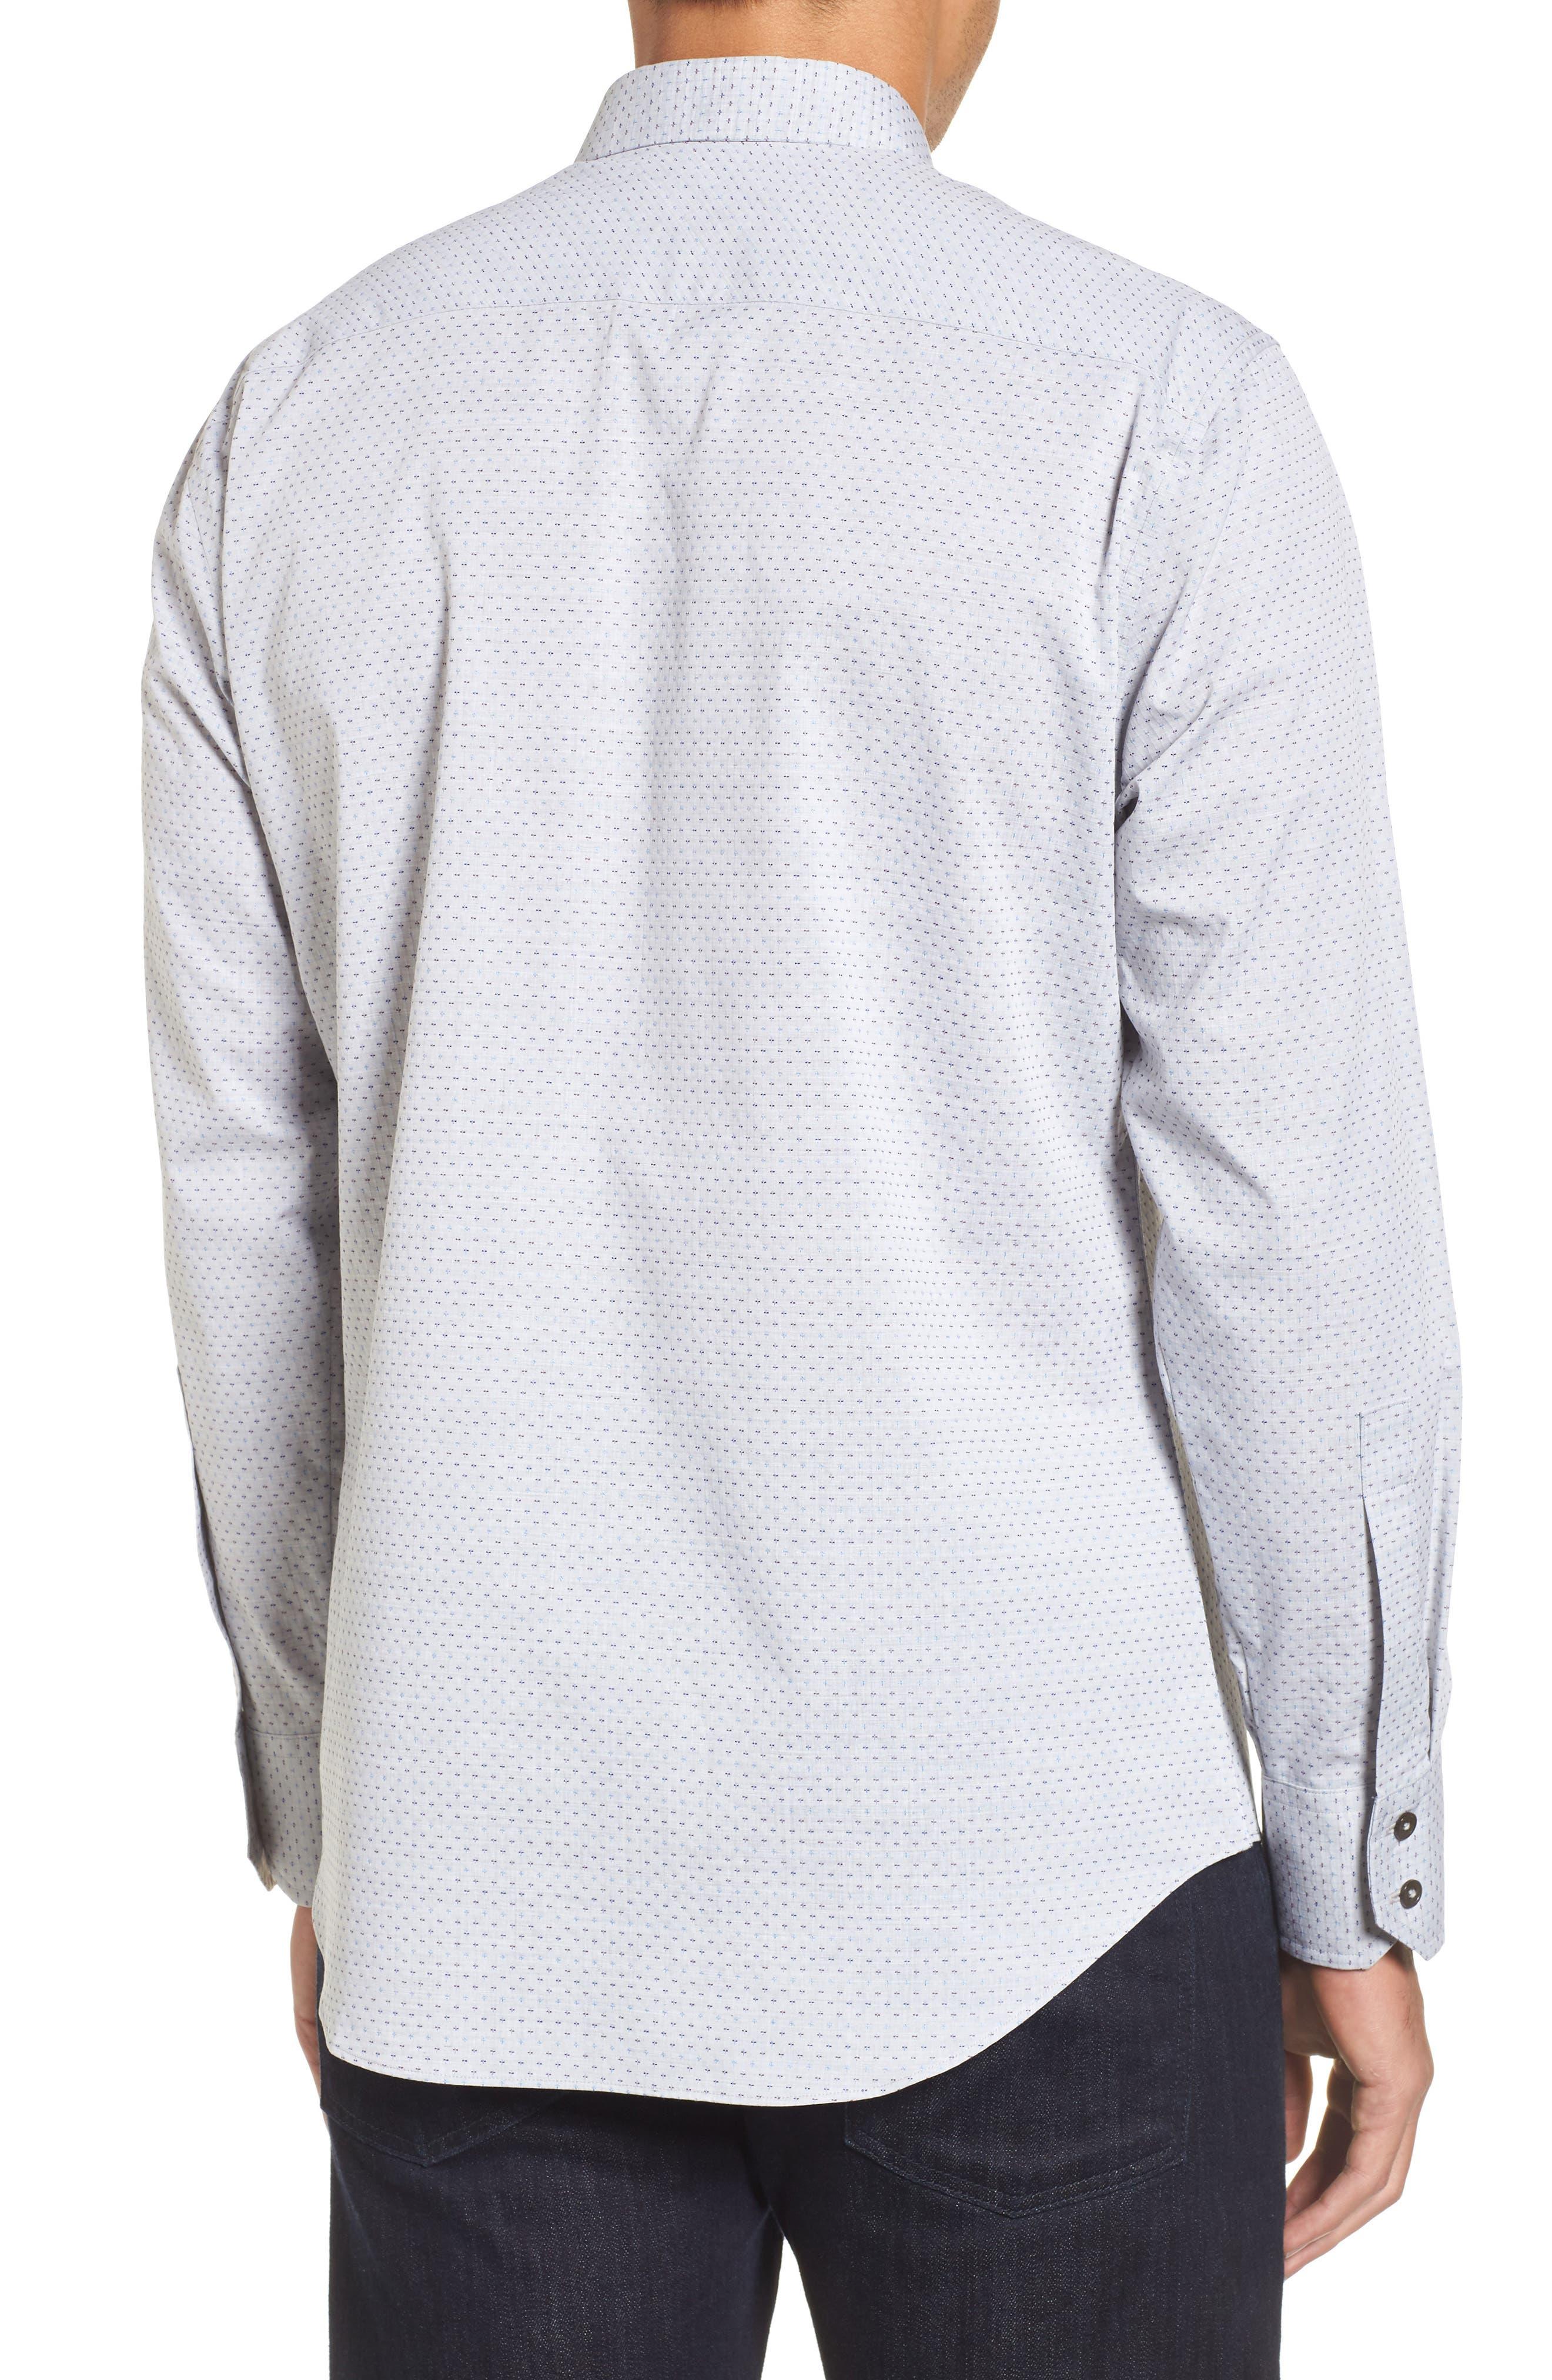 Atila Slim Fit Dobby Woven Sport Shirt,                             Alternate thumbnail 2, color,                             Light Grey